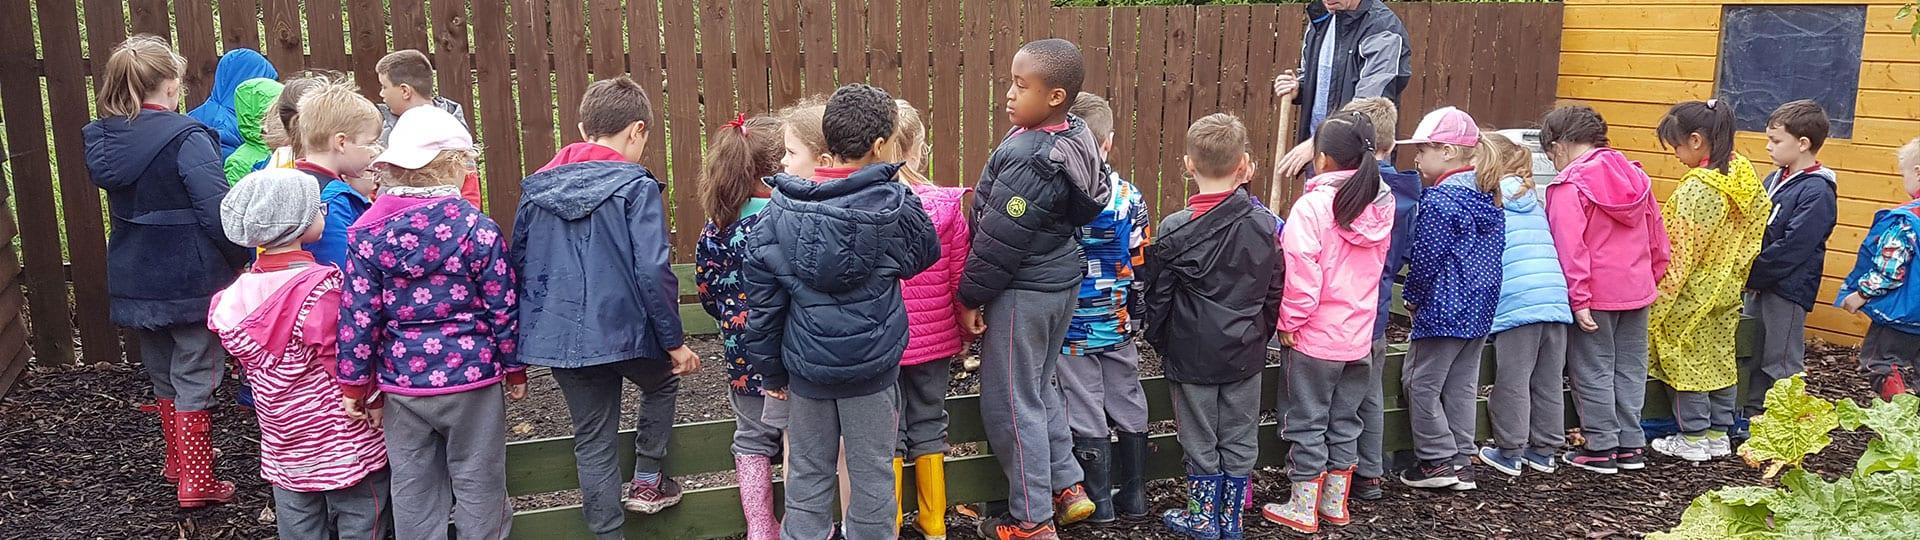 Creche Childcare Tours Kids Mellowes Banner 1920x540